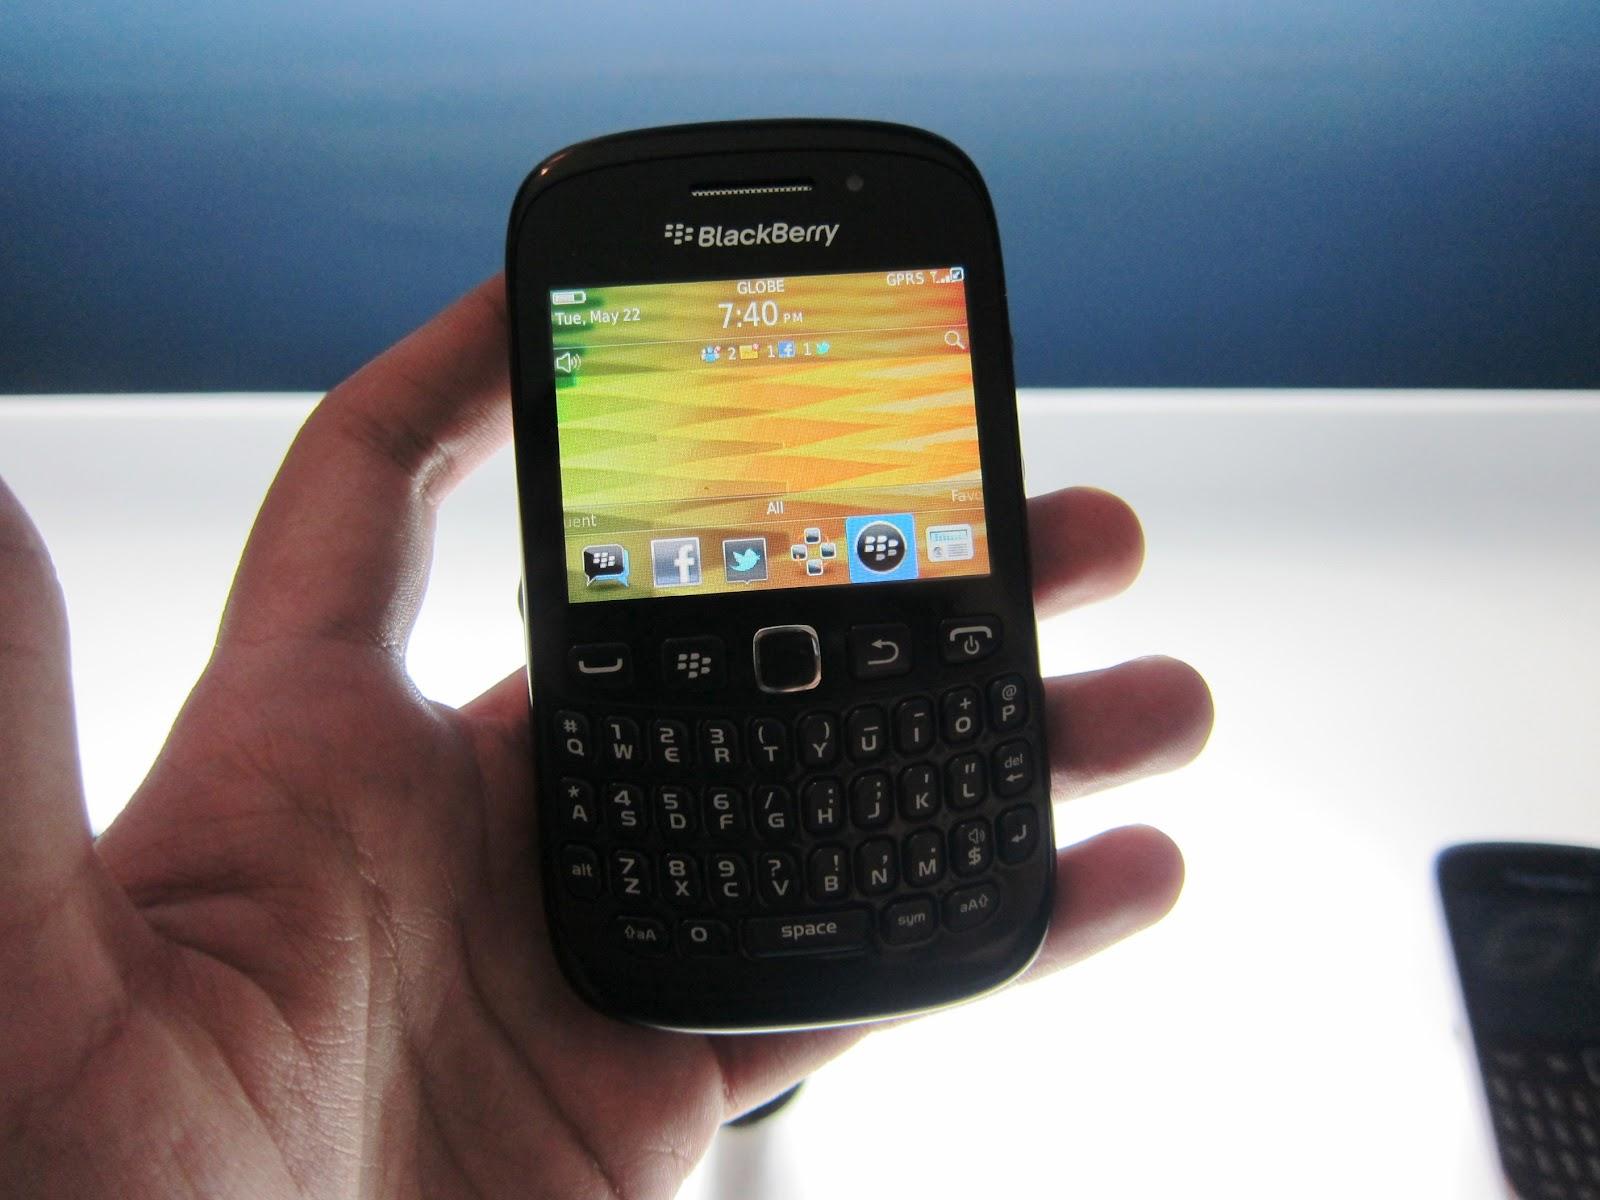 download zip application for blackberry 8520